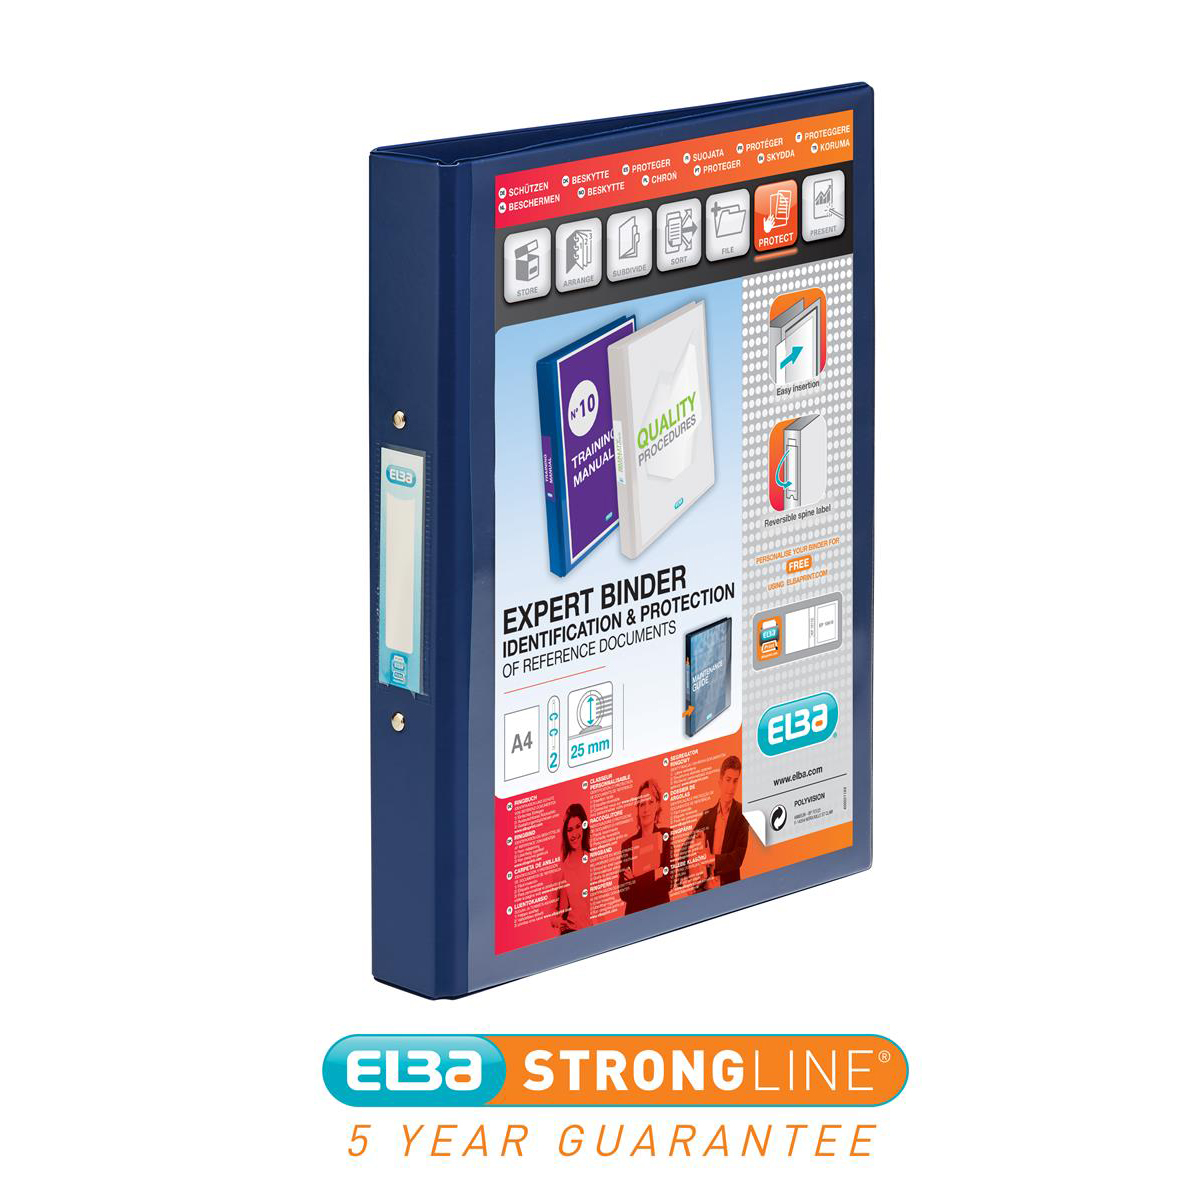 Elba Vision 25mm RBnder 2R Blu 100080886